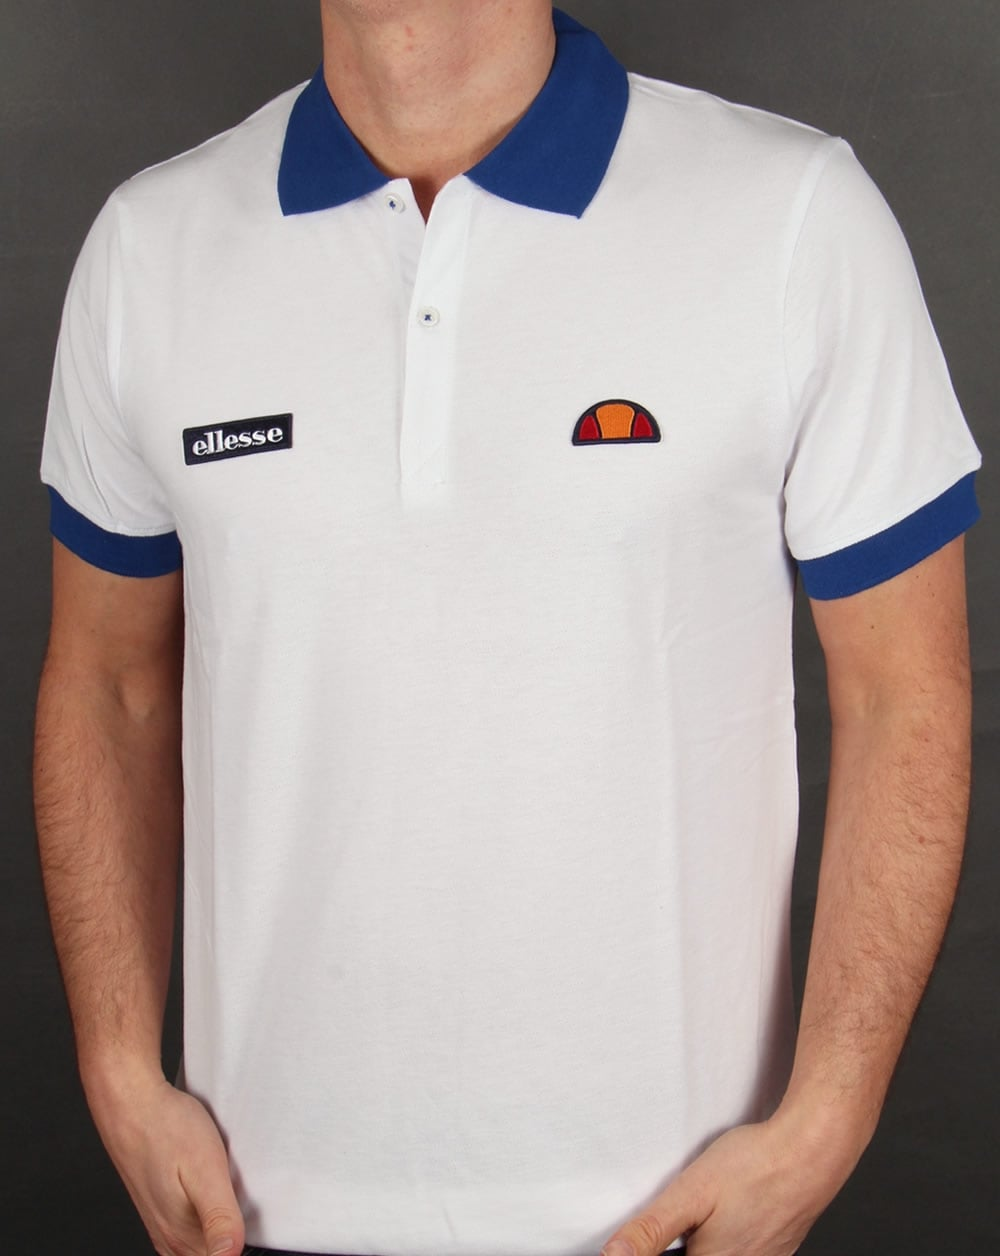 d7365d5fee Ellesse 80s Collar Polo Shirt White